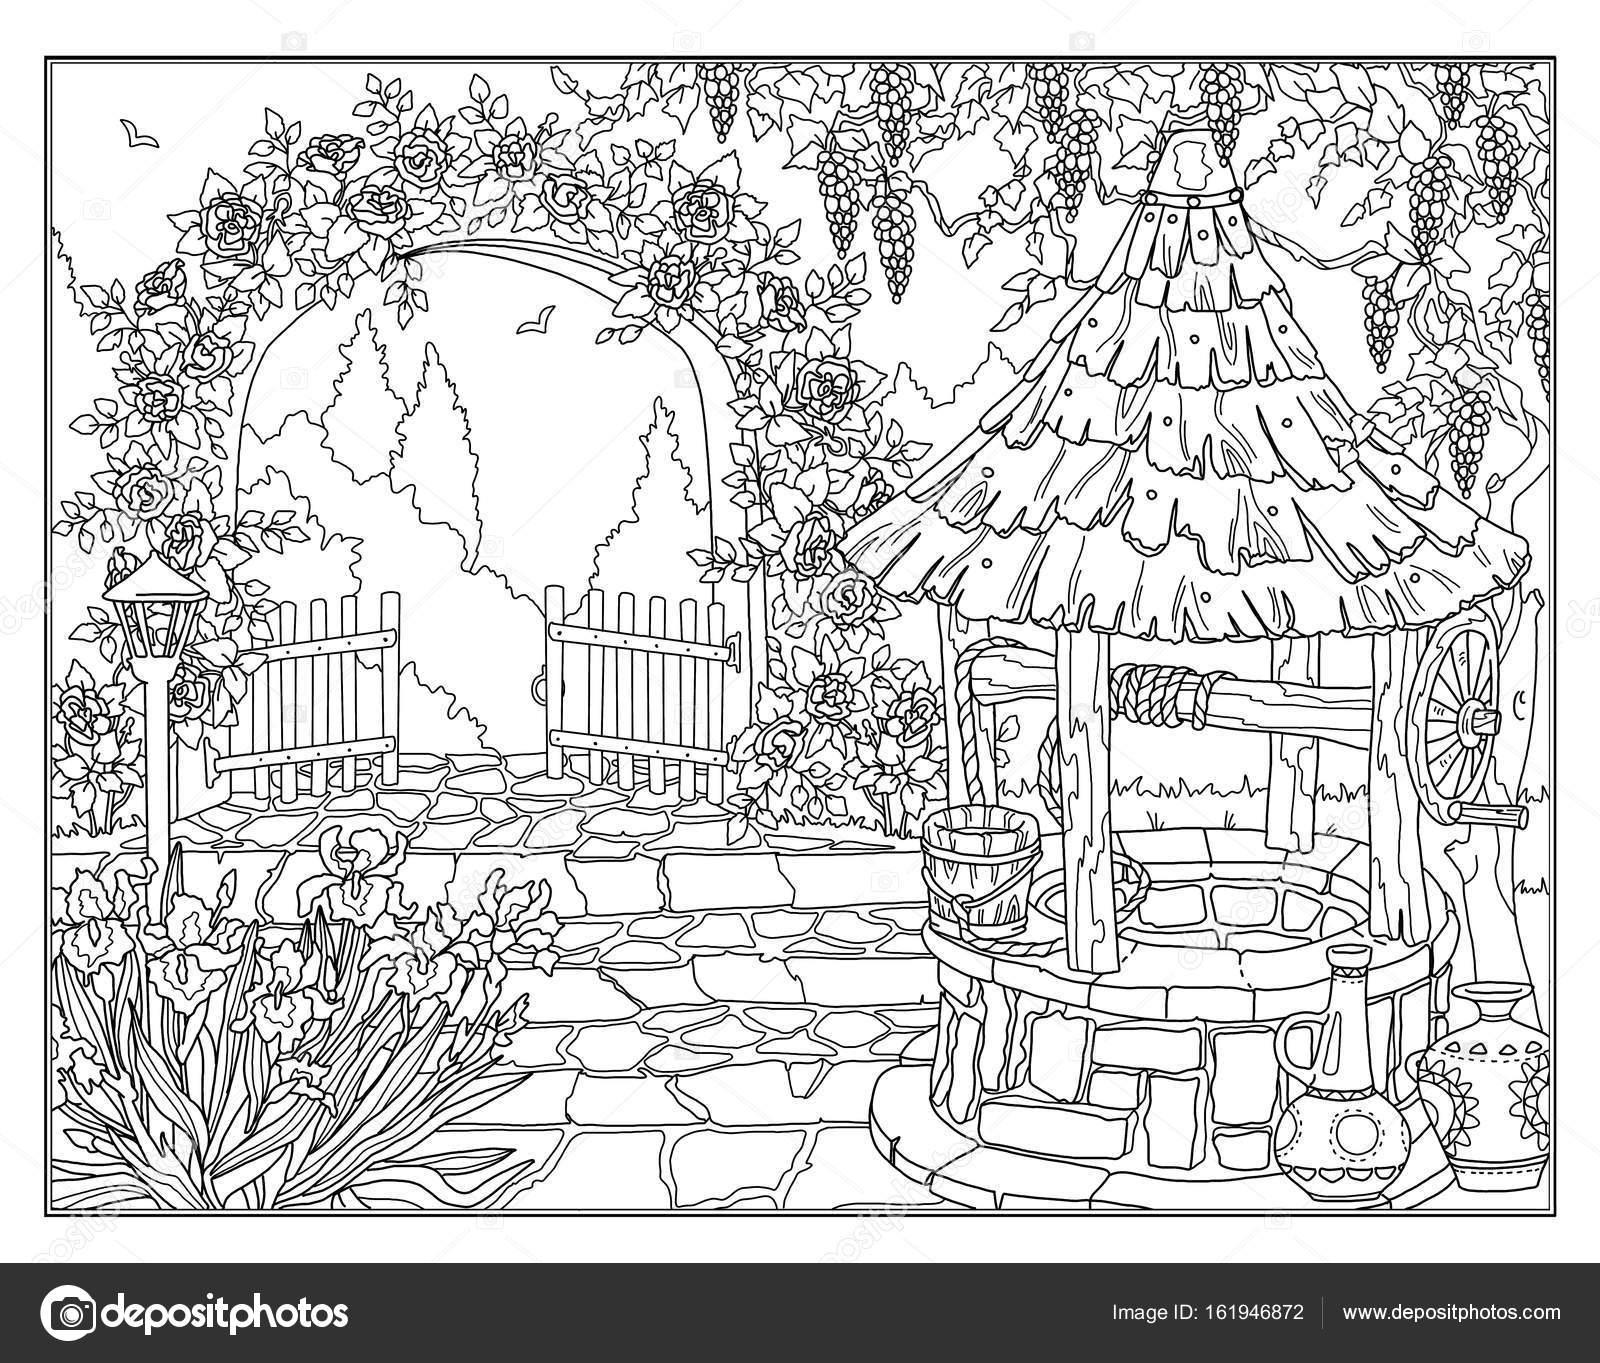 Boyama Sayfa Bahçe Stok Foto Larisakuzovkova 161946872